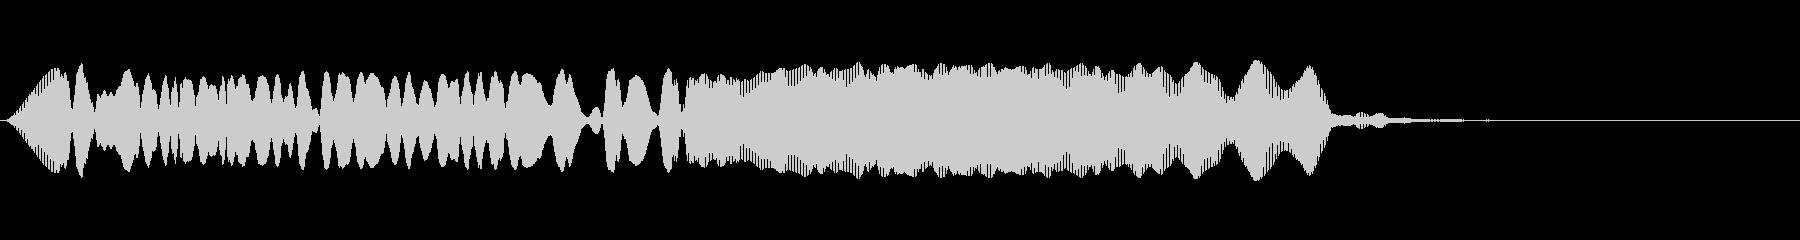 THEREMIN:トーキングアクセ...の未再生の波形